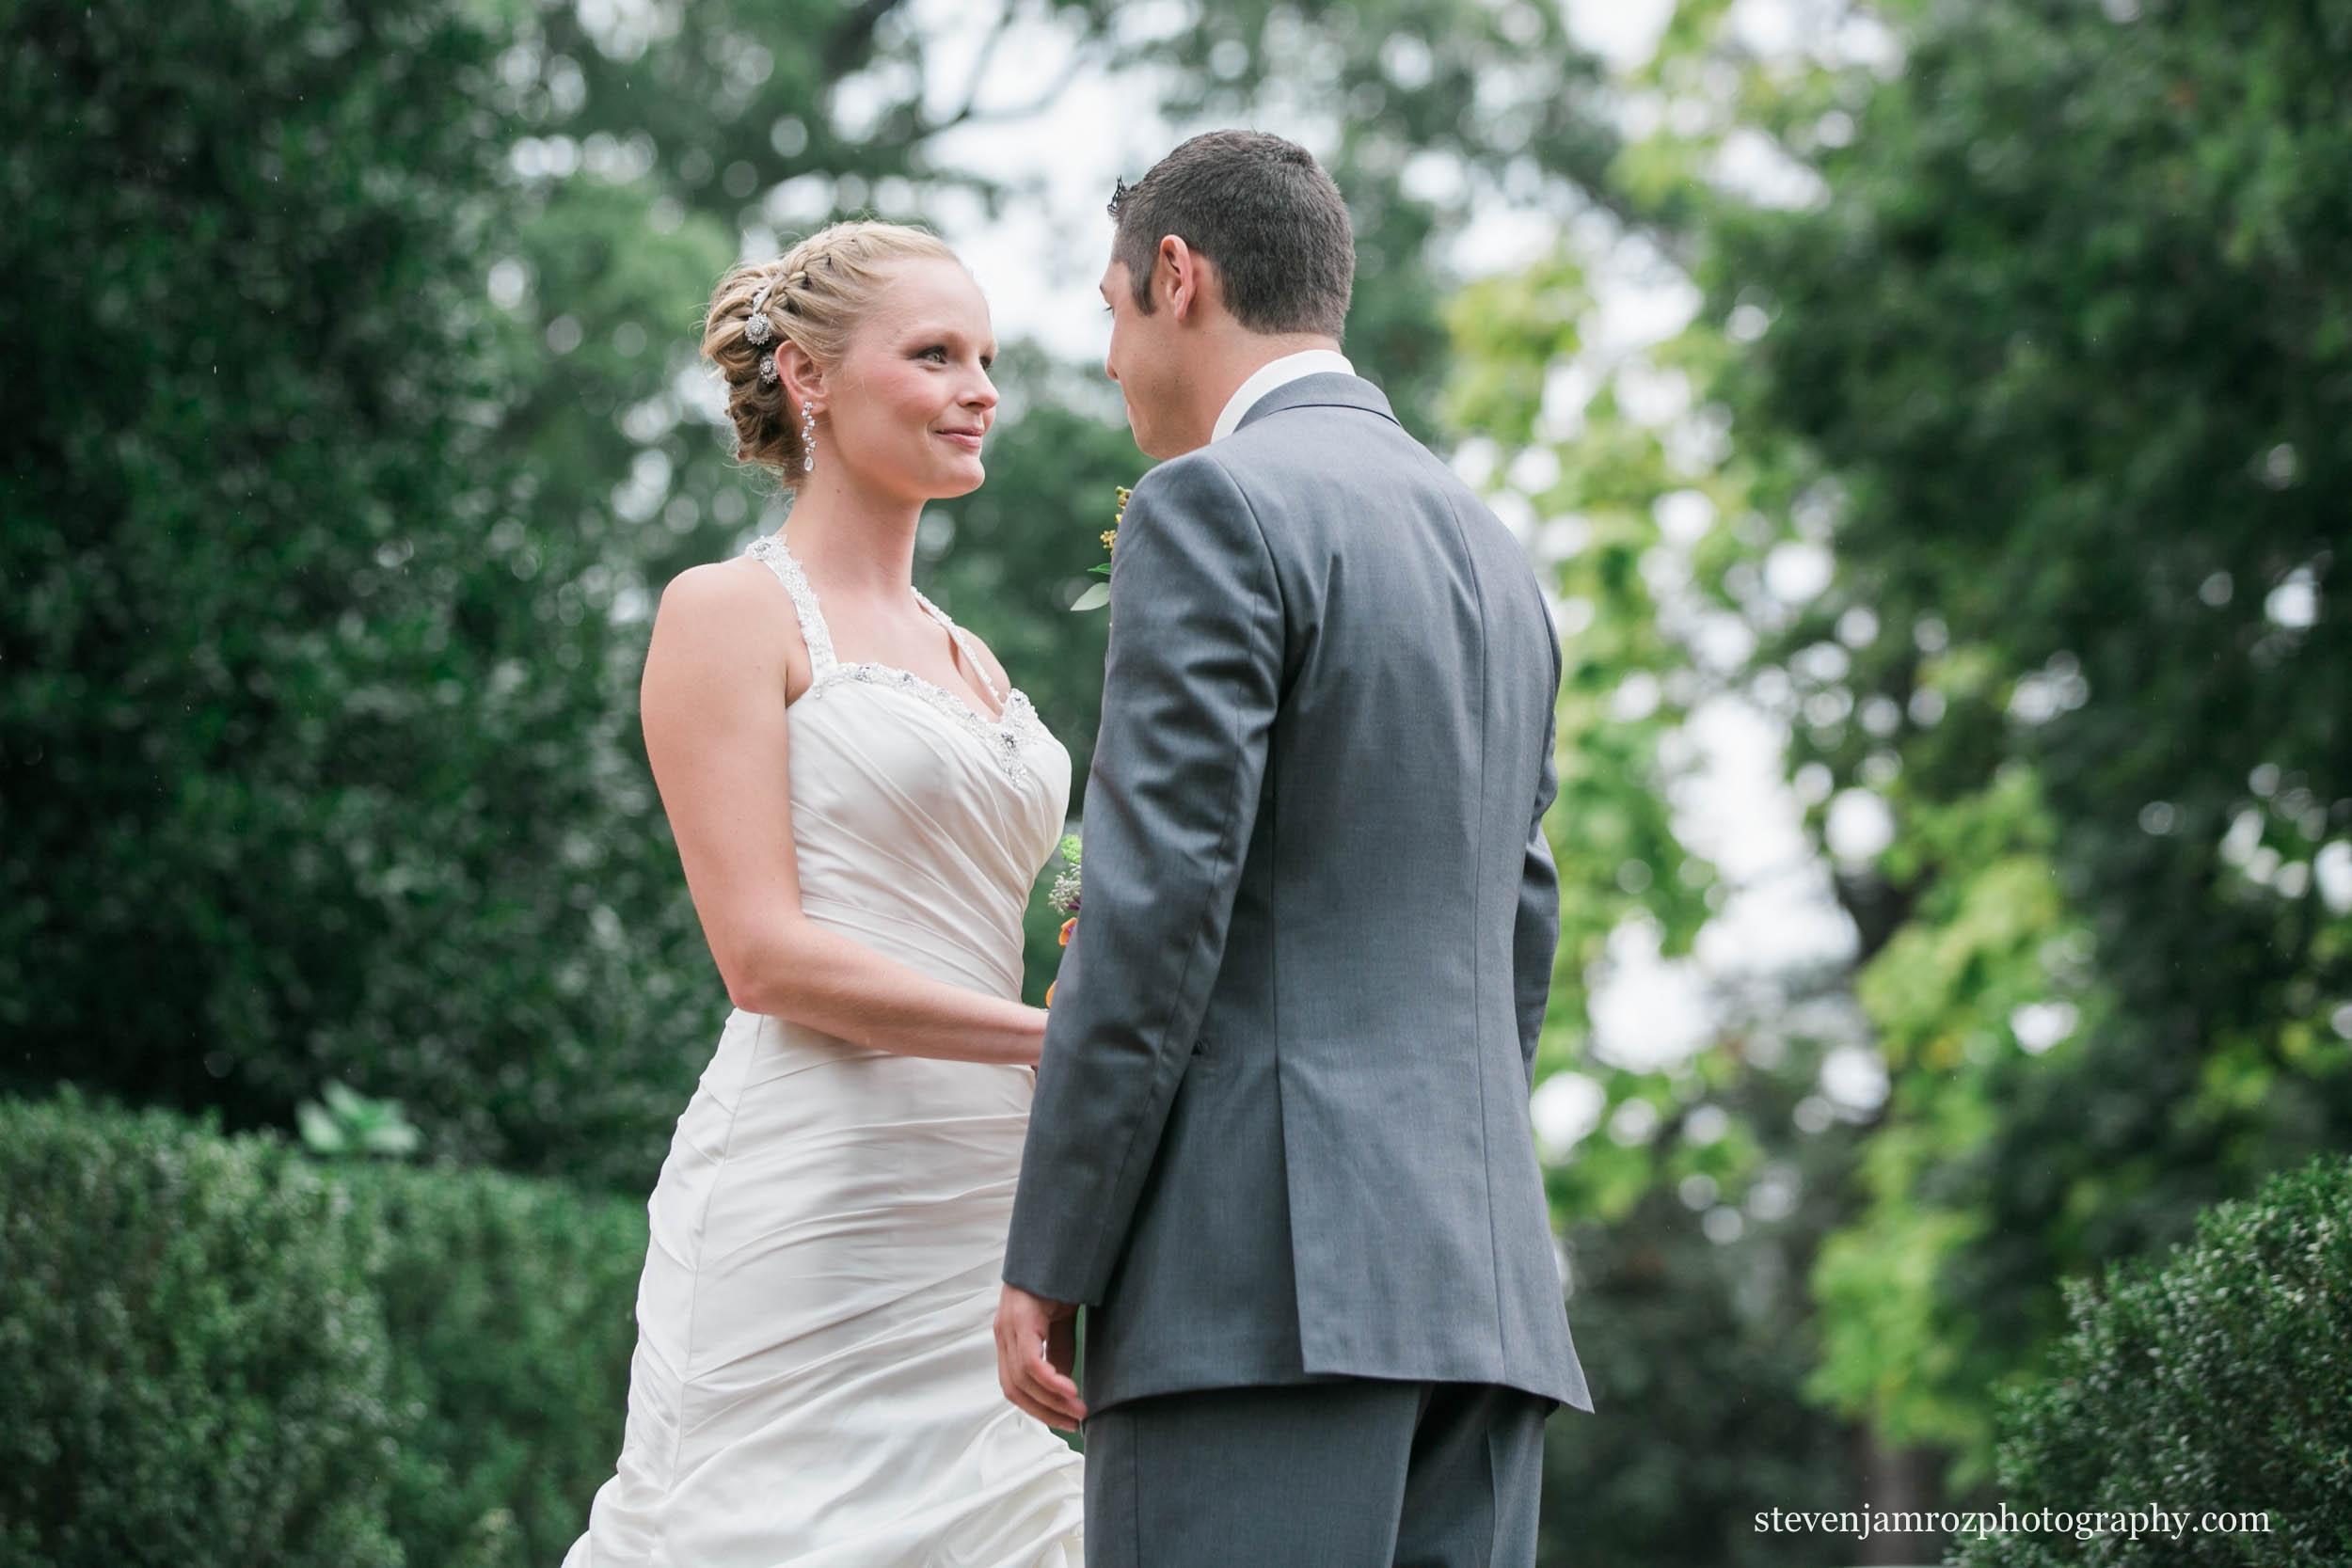 louisburg-nc-wedding-venues-hudson-manor-0903.jpg